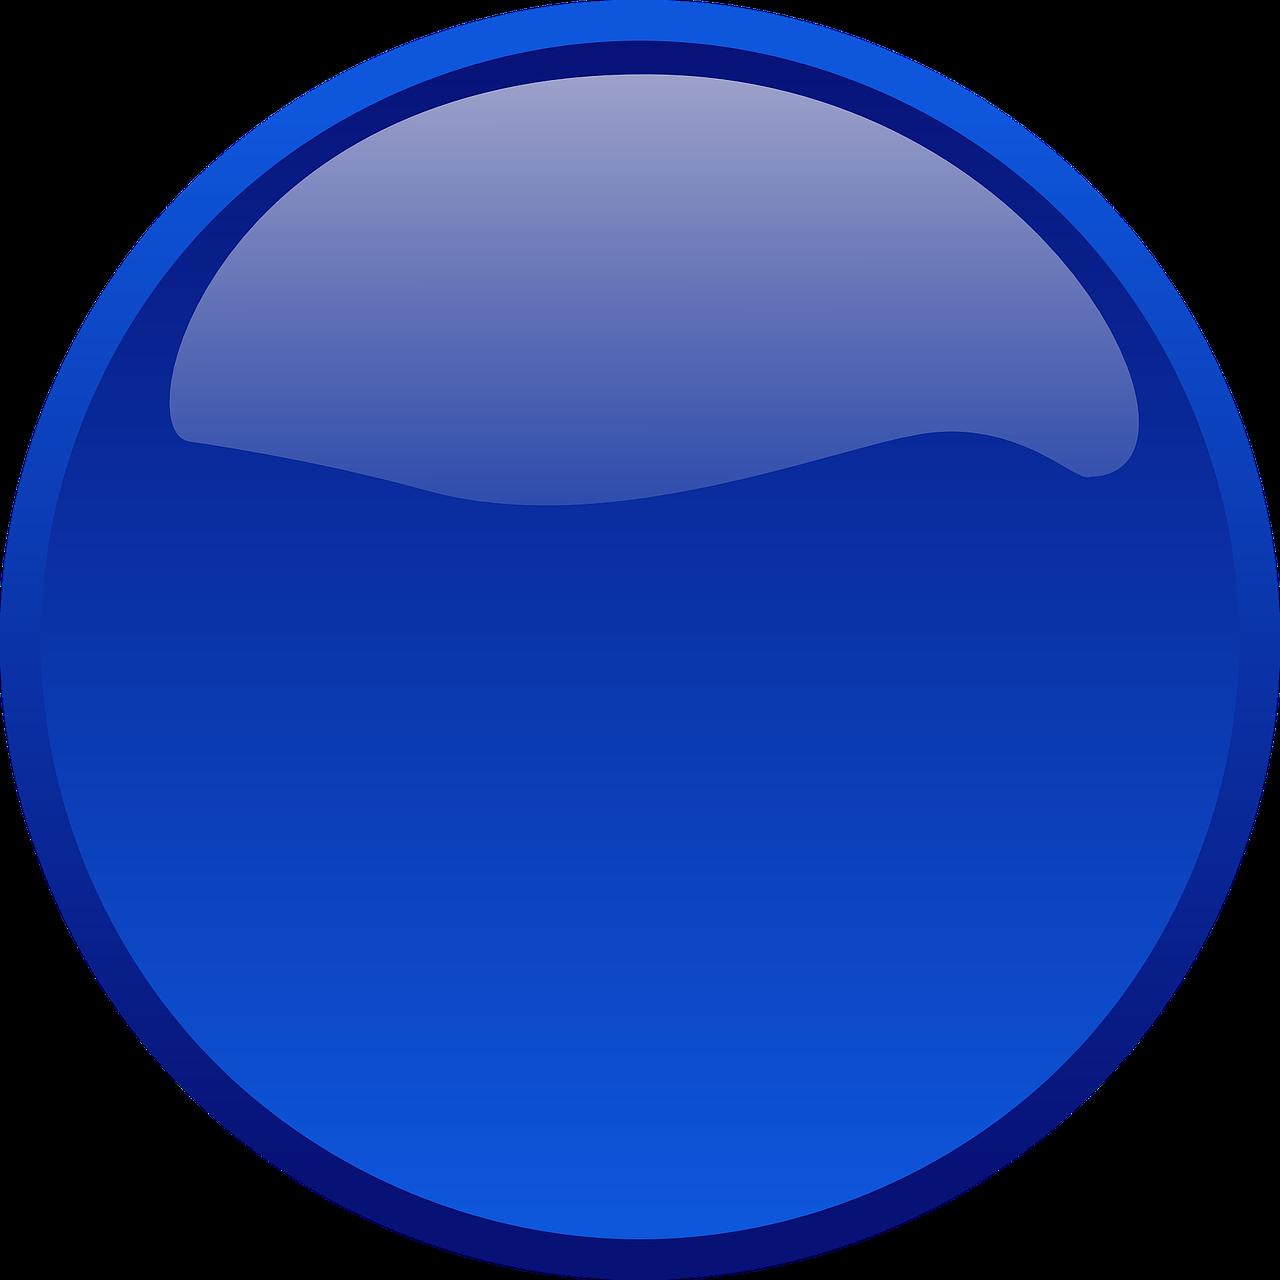 transparent download Button circle glass free. Vector blue shape